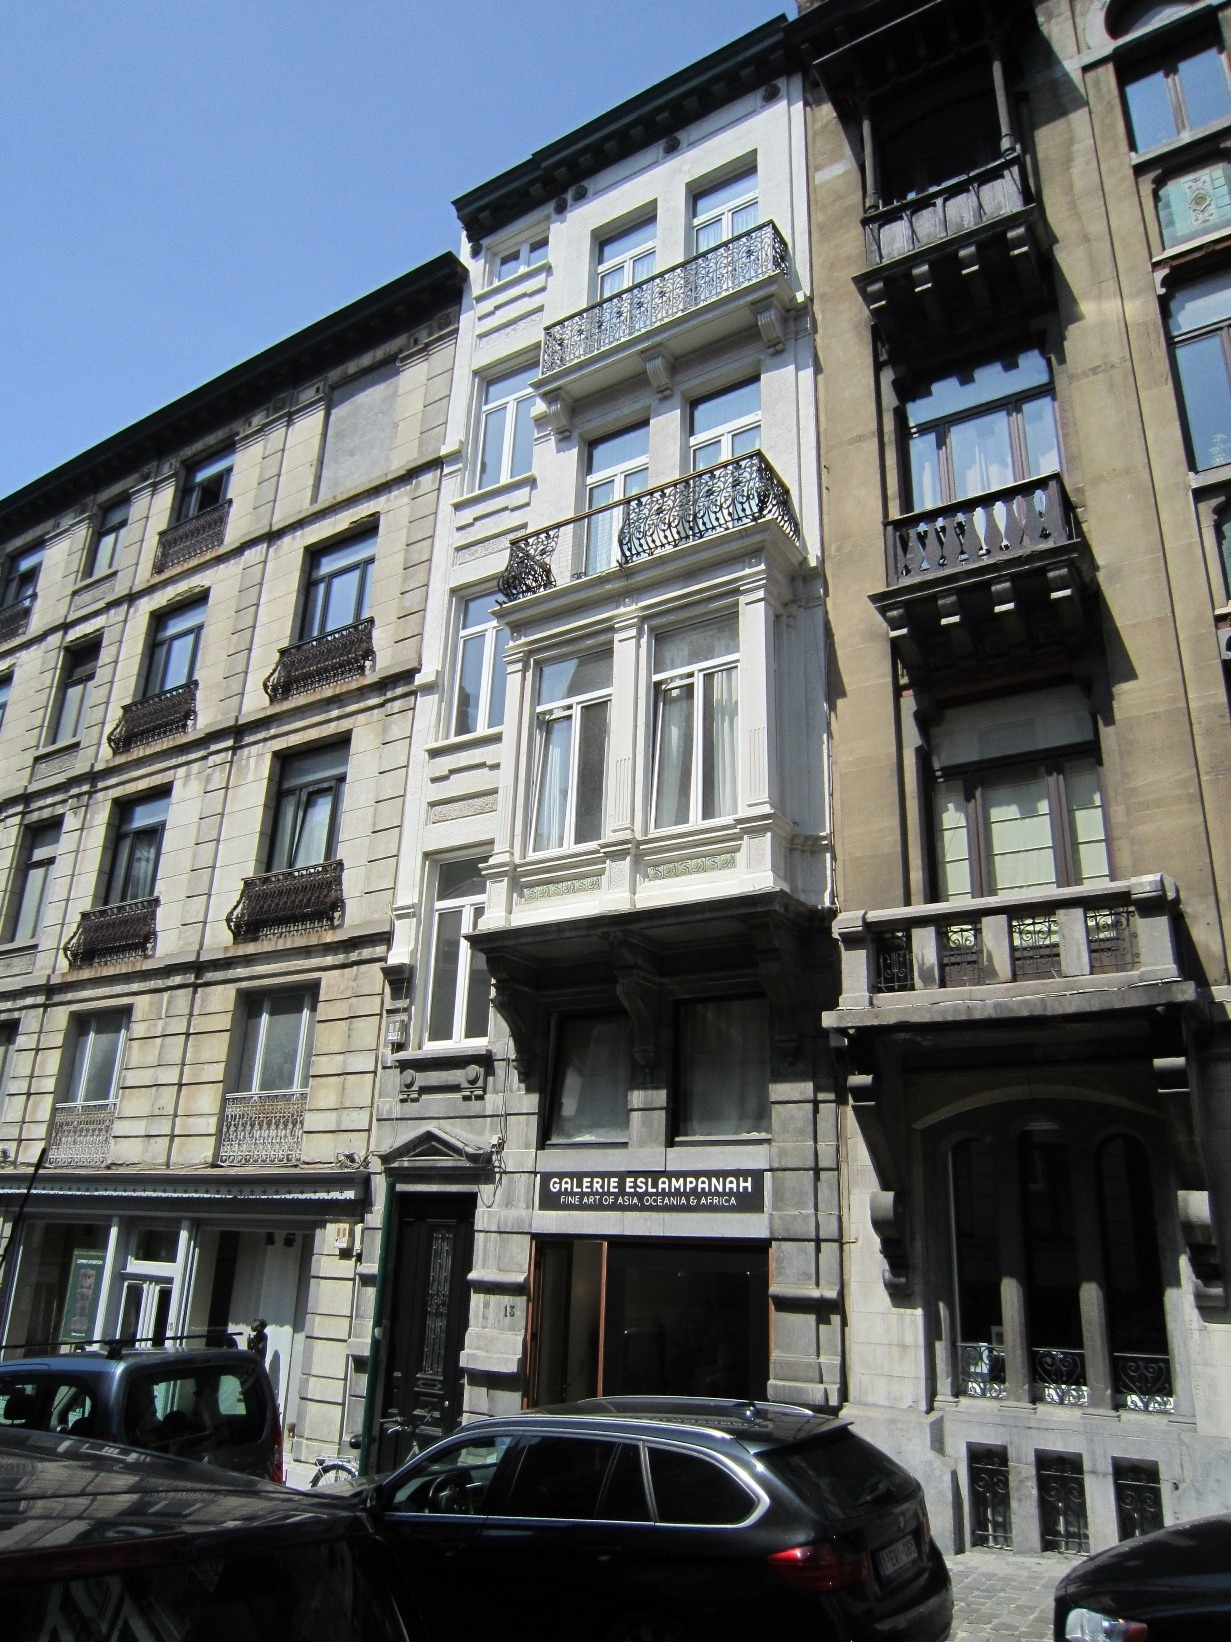 Rue Charles Hanssens 13, 2015